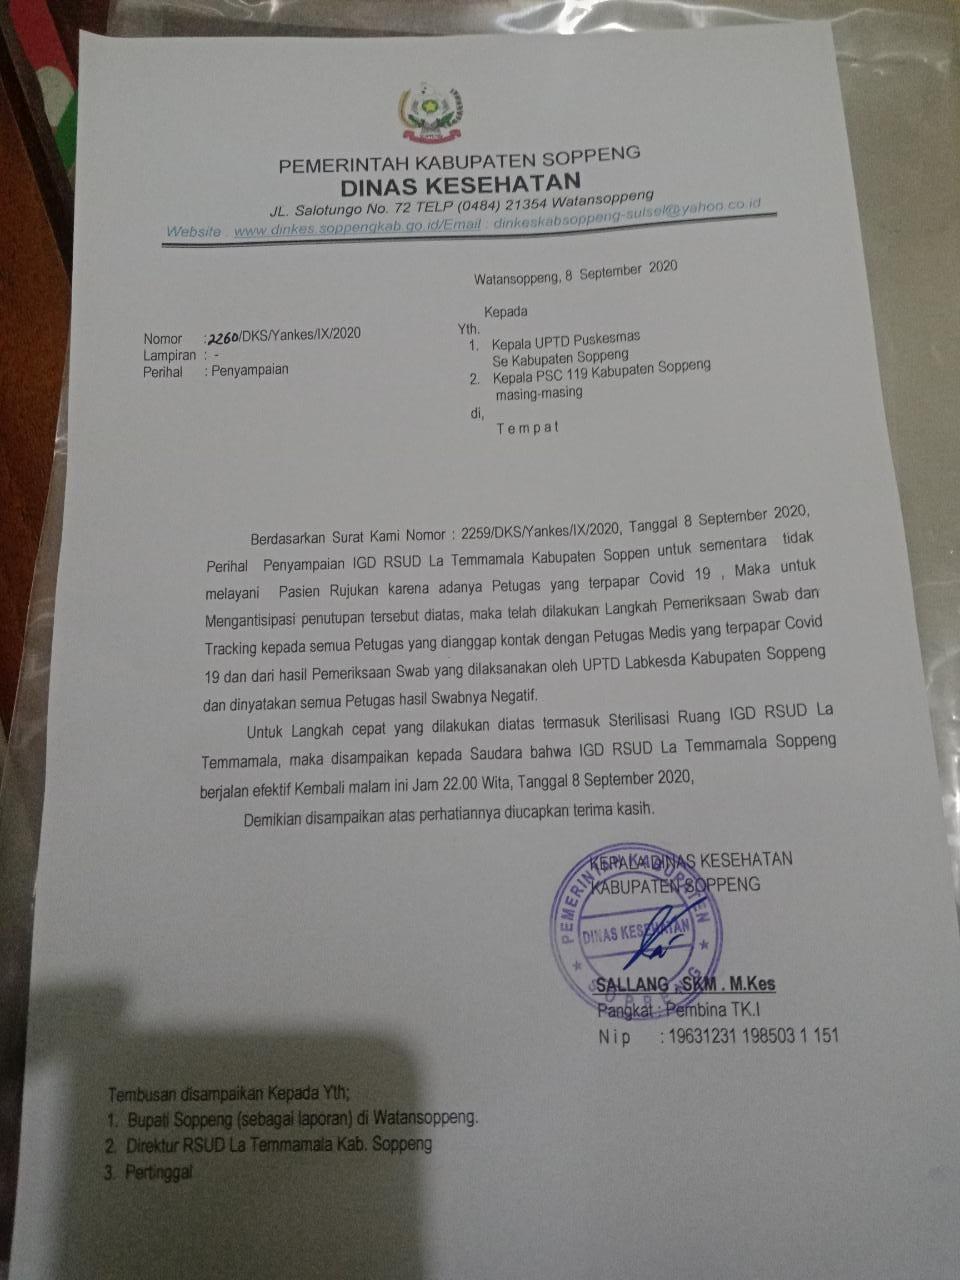 Pasca Seorang  Dokter Terpapar Covid, Pelayanan IGD RSUD La Temmamala Kini Kembali Dibuka